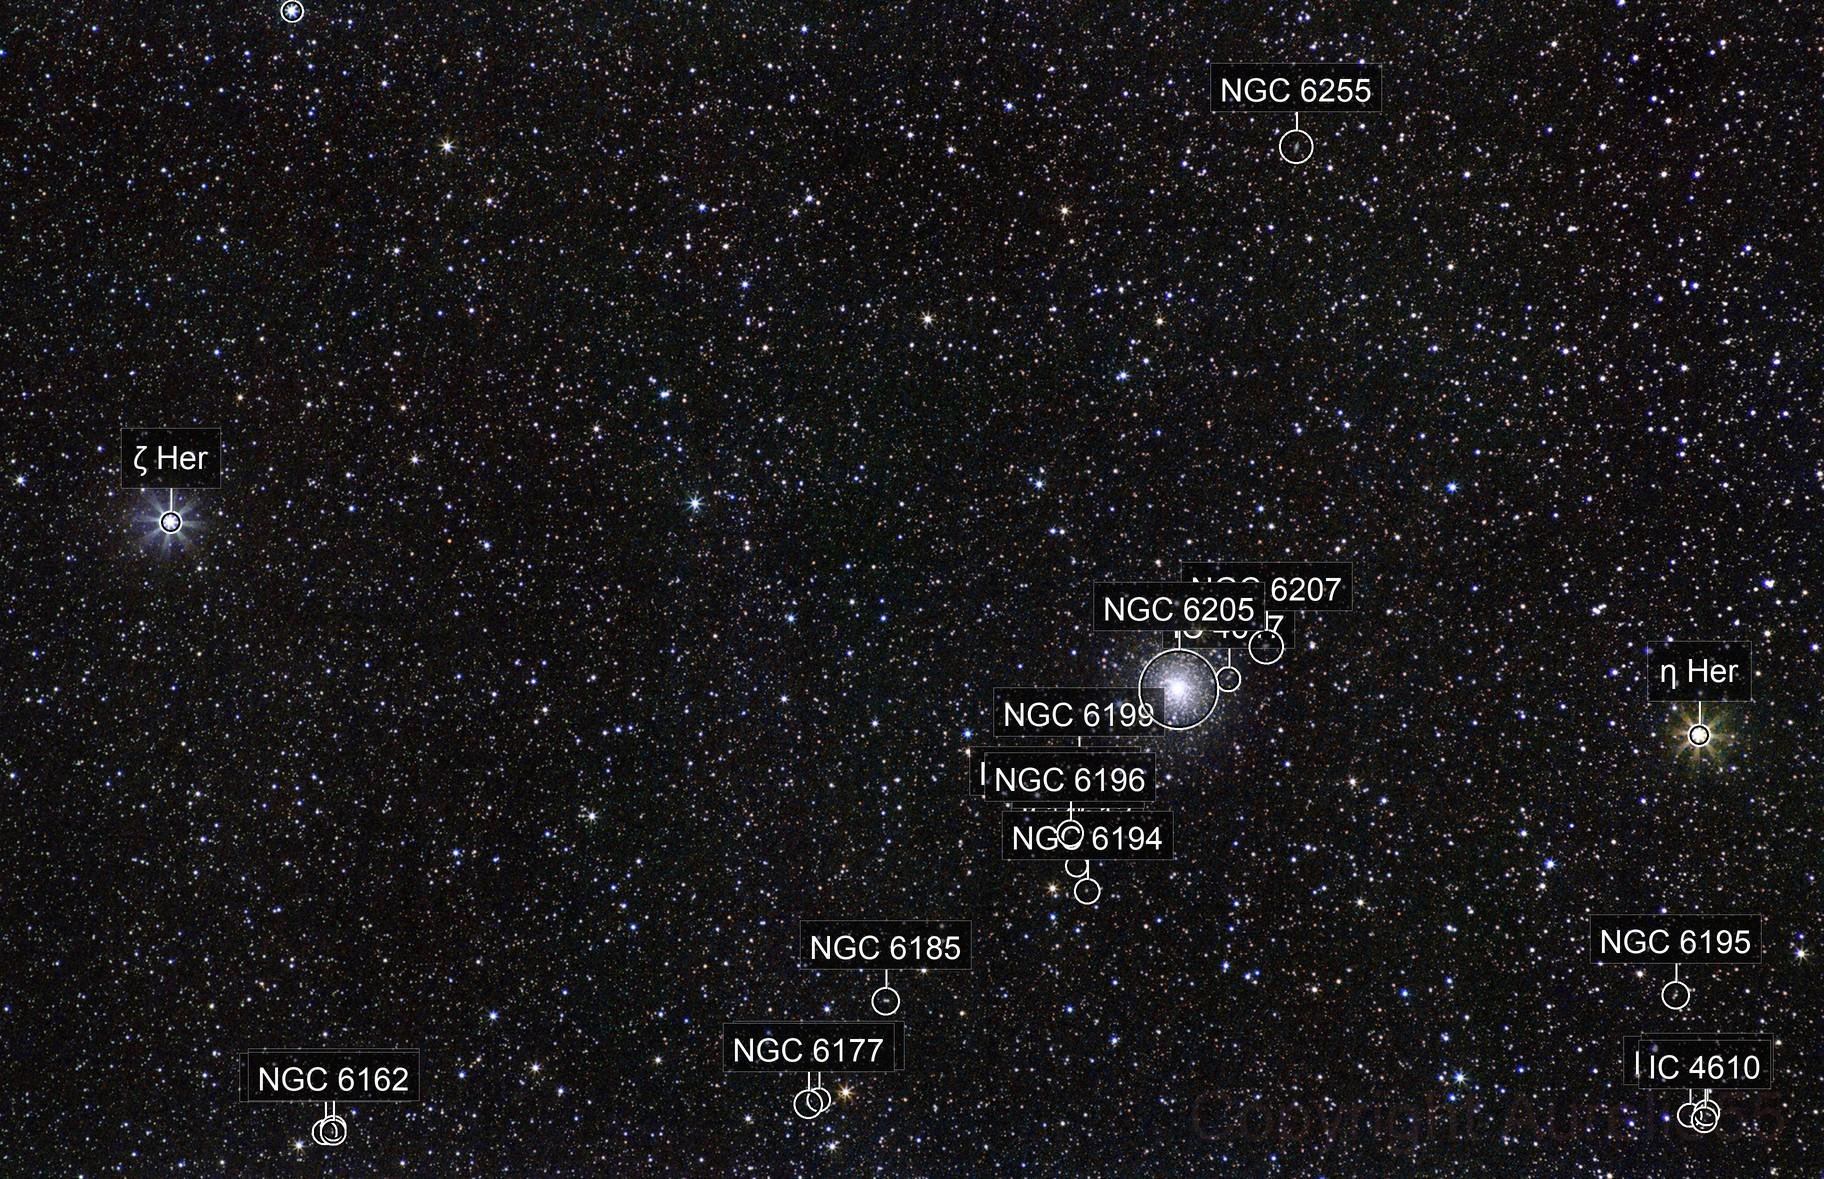 The jewel between Eta and Zeta Herculis